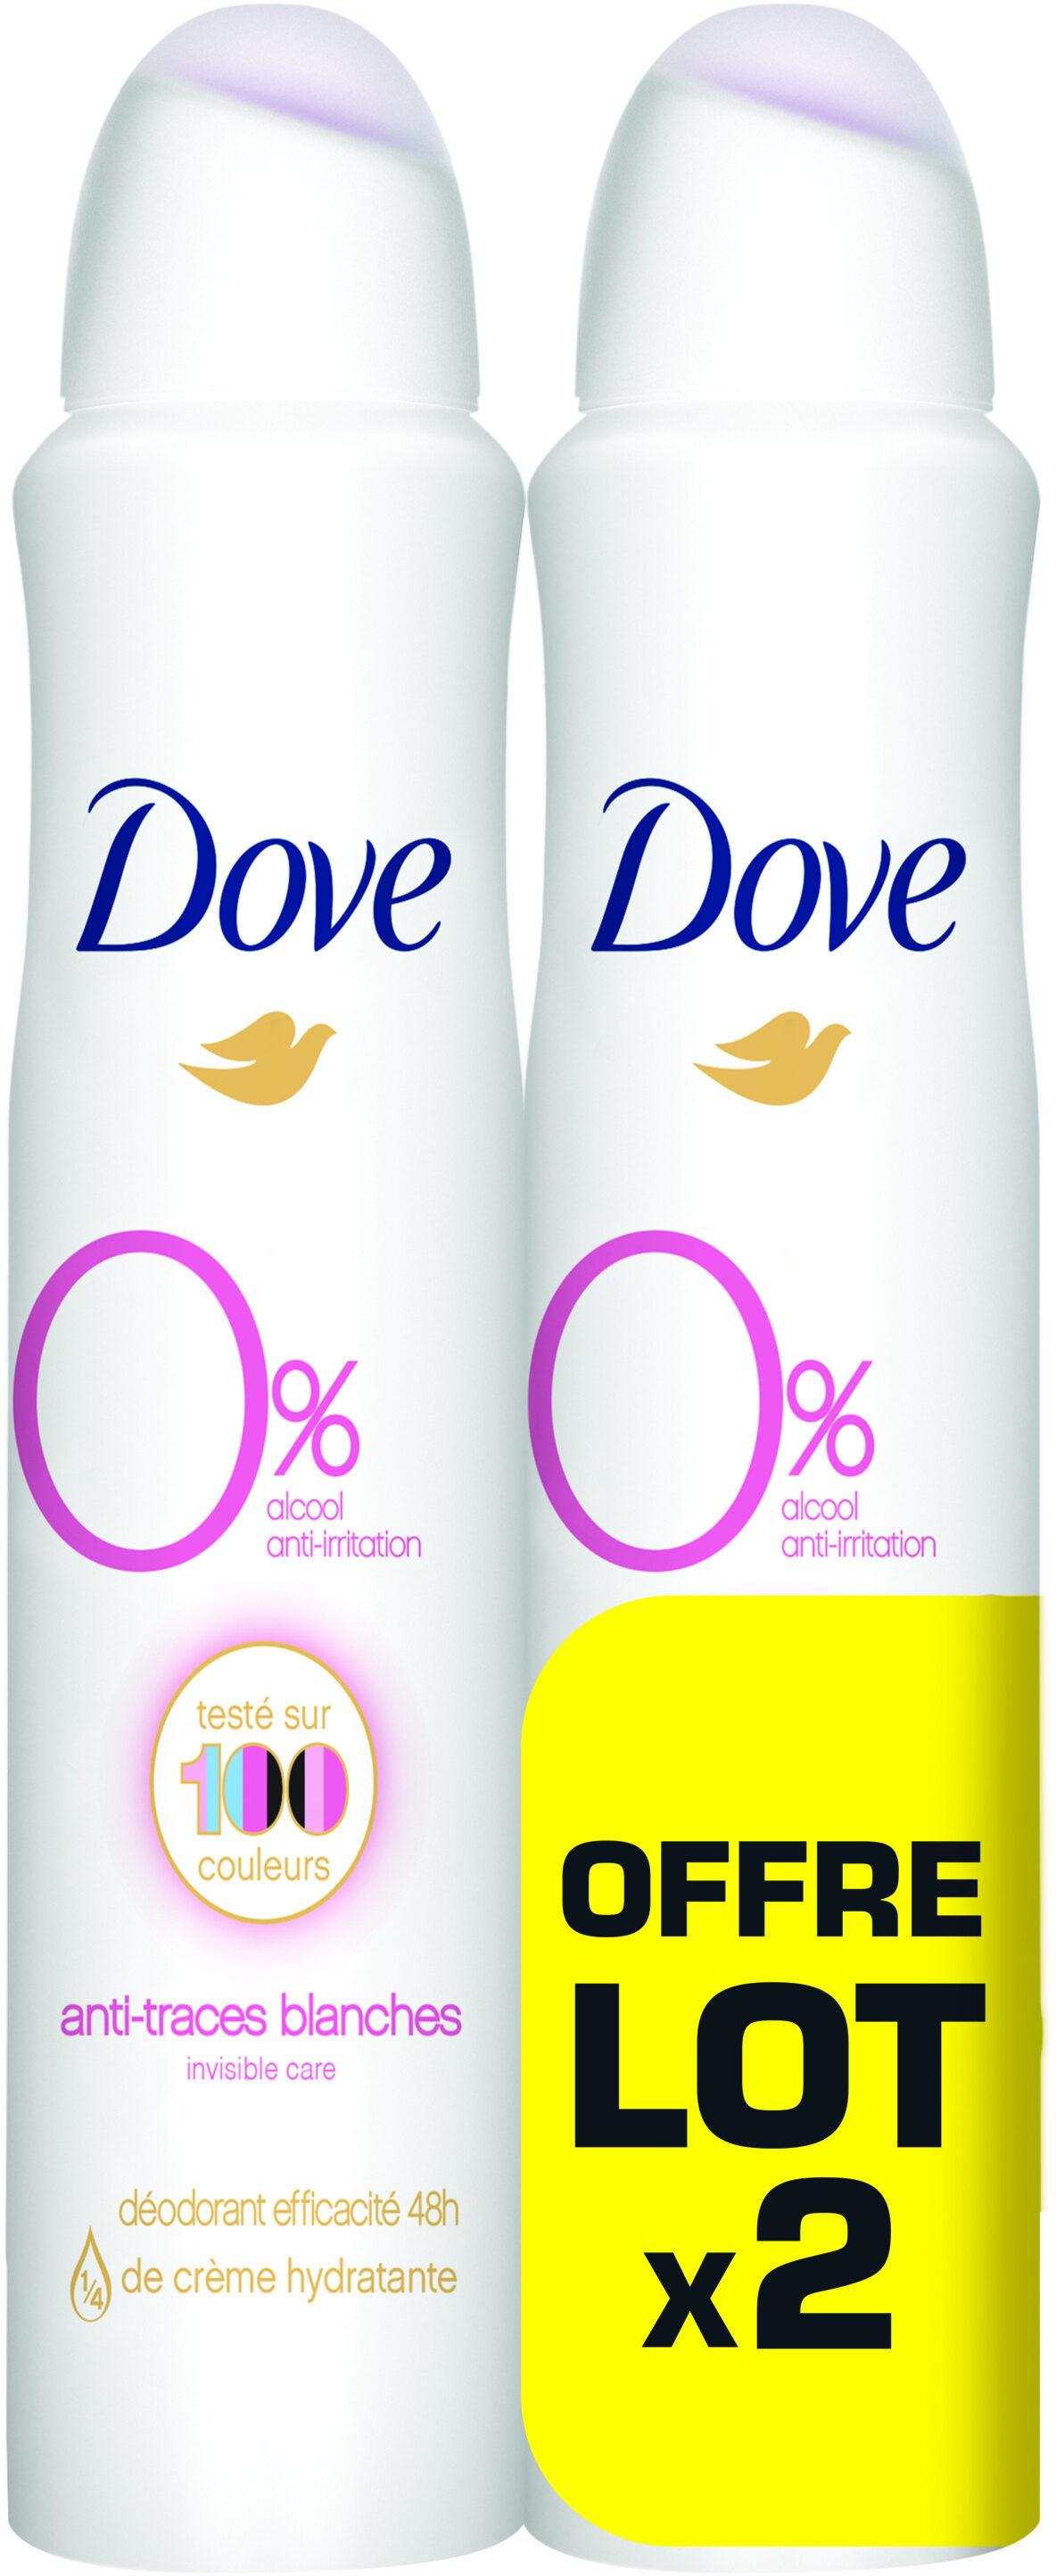 Dove Déodorant Femme Spray Invisible Care 200ml Lot de 2 - Product - fr